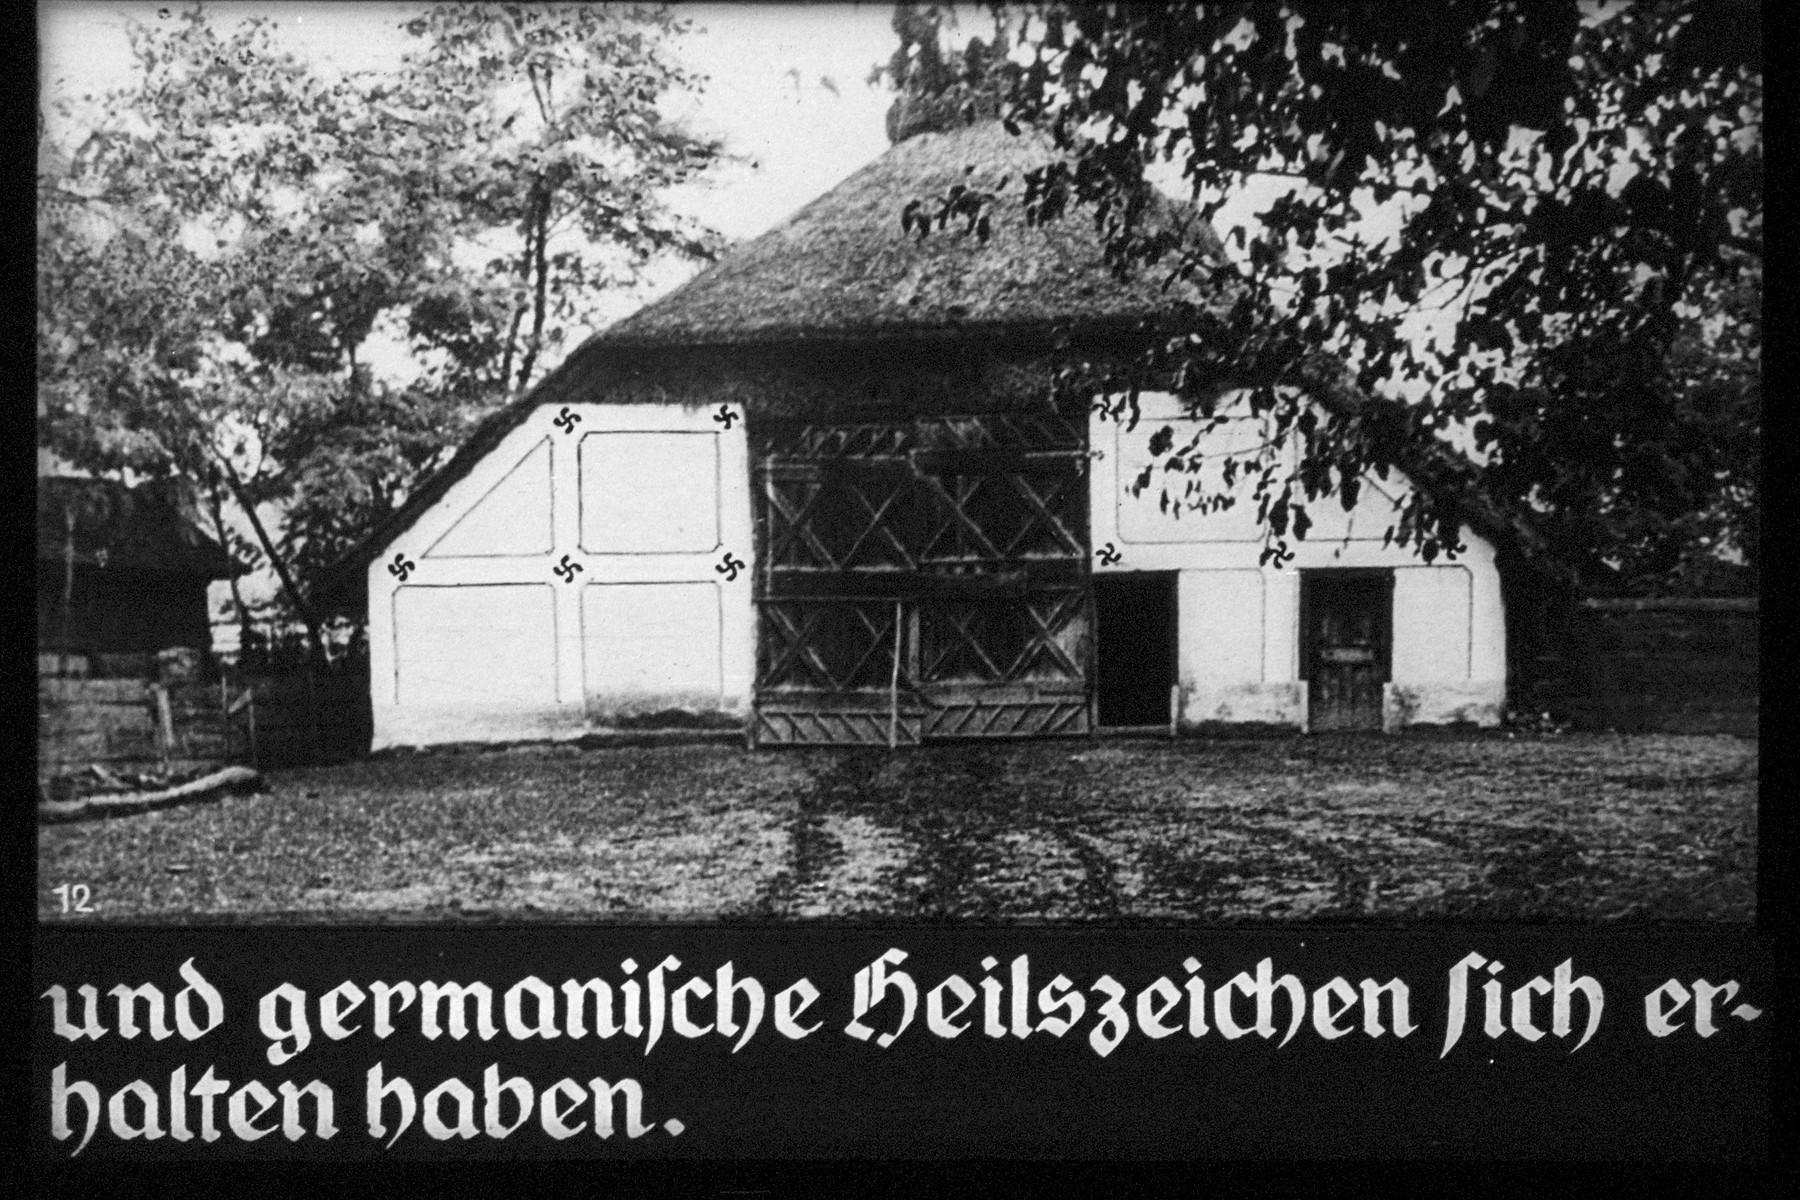 "12th Nazi propaganda slide of a Hitler Youth educational presentation entitled ""German Achievements in the East"" (G 2)  und germanische Heilszeichen sich erhalten haben. // and Germanic healing characters have been preserved."